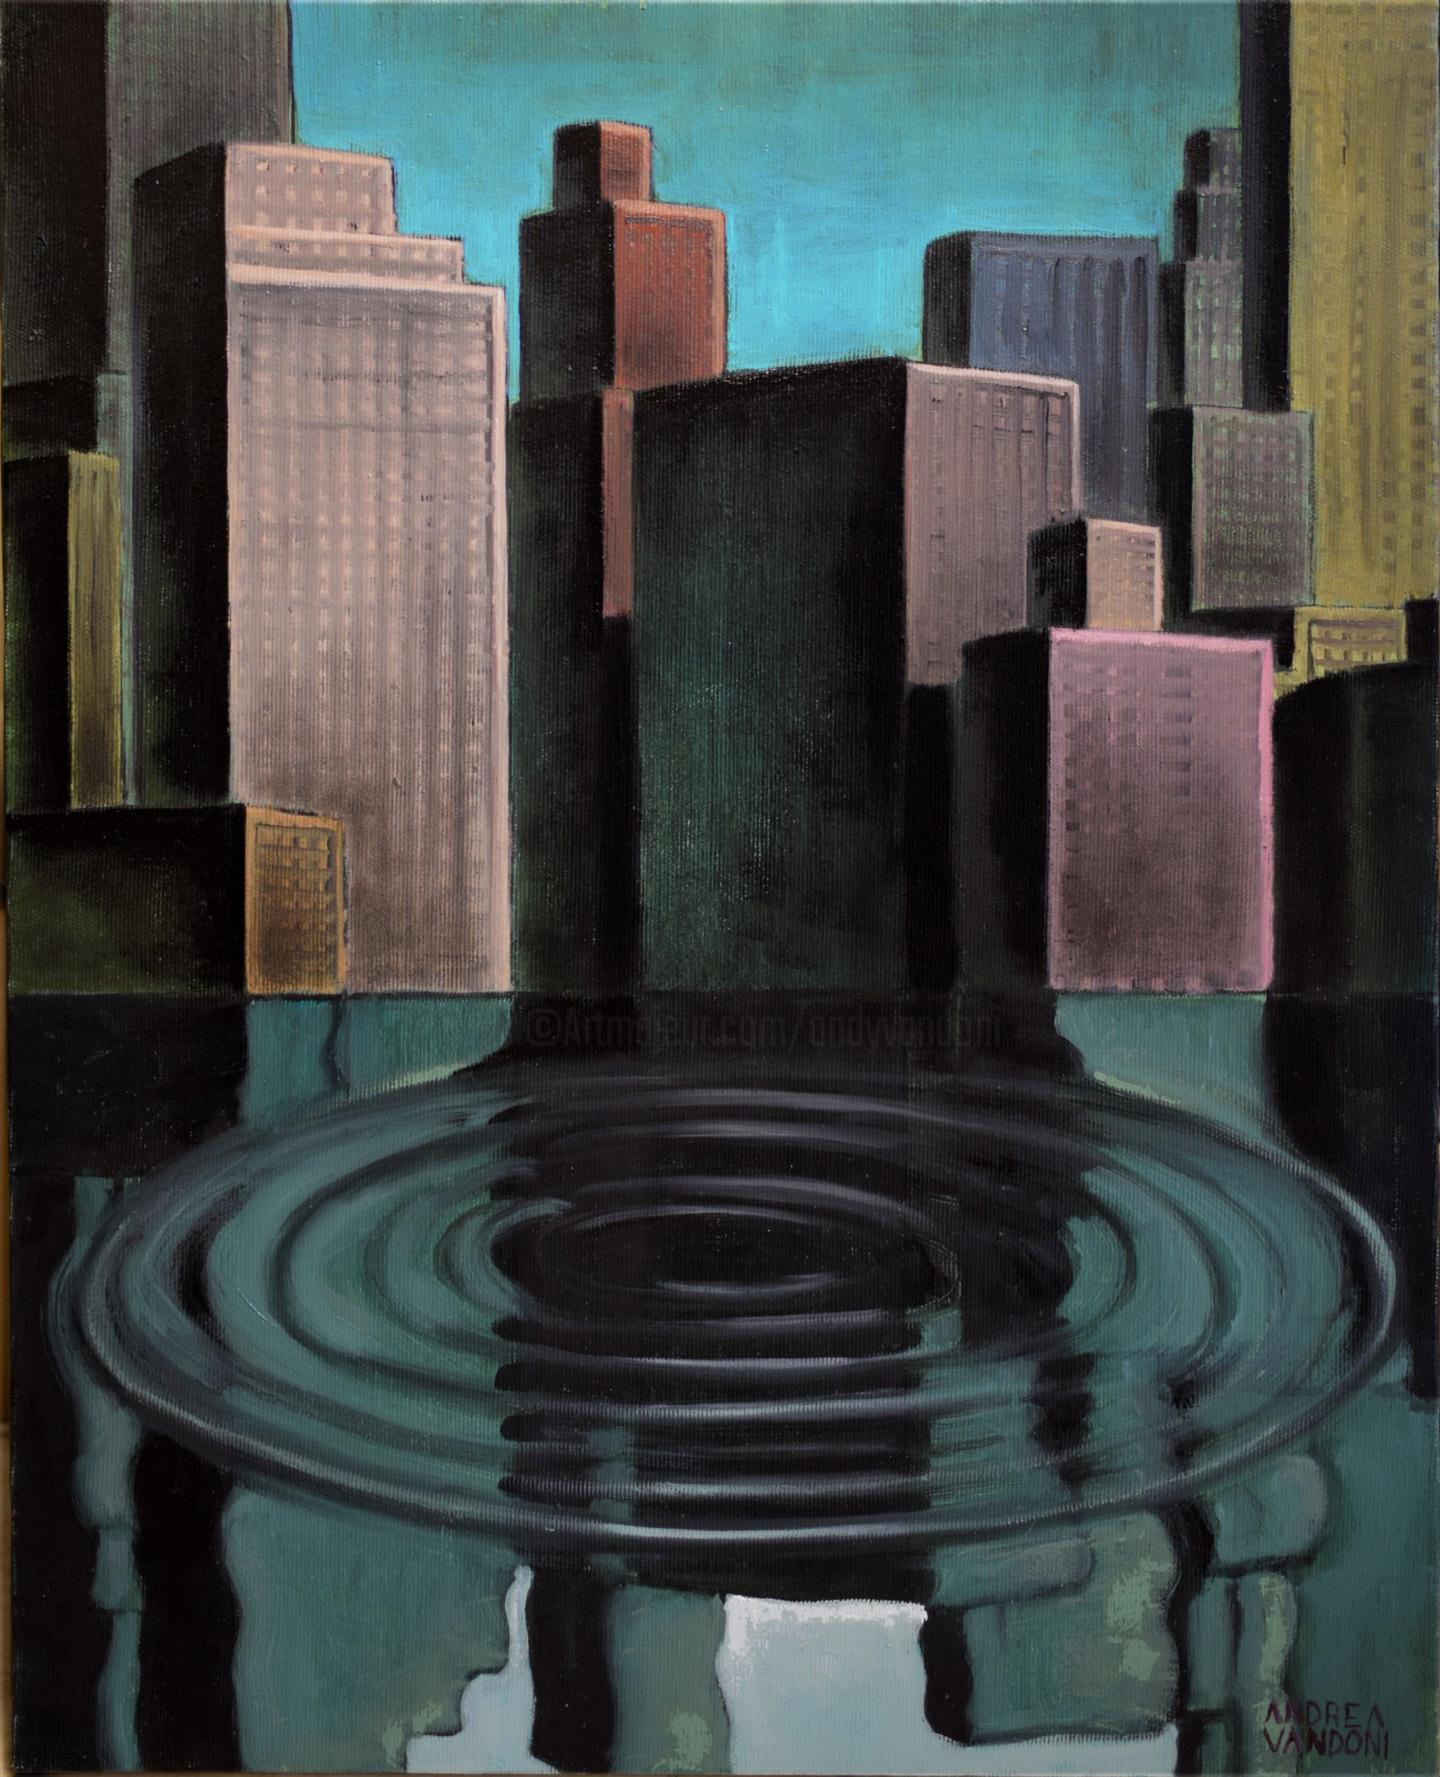 Andrea Vandoni - American Waterscape